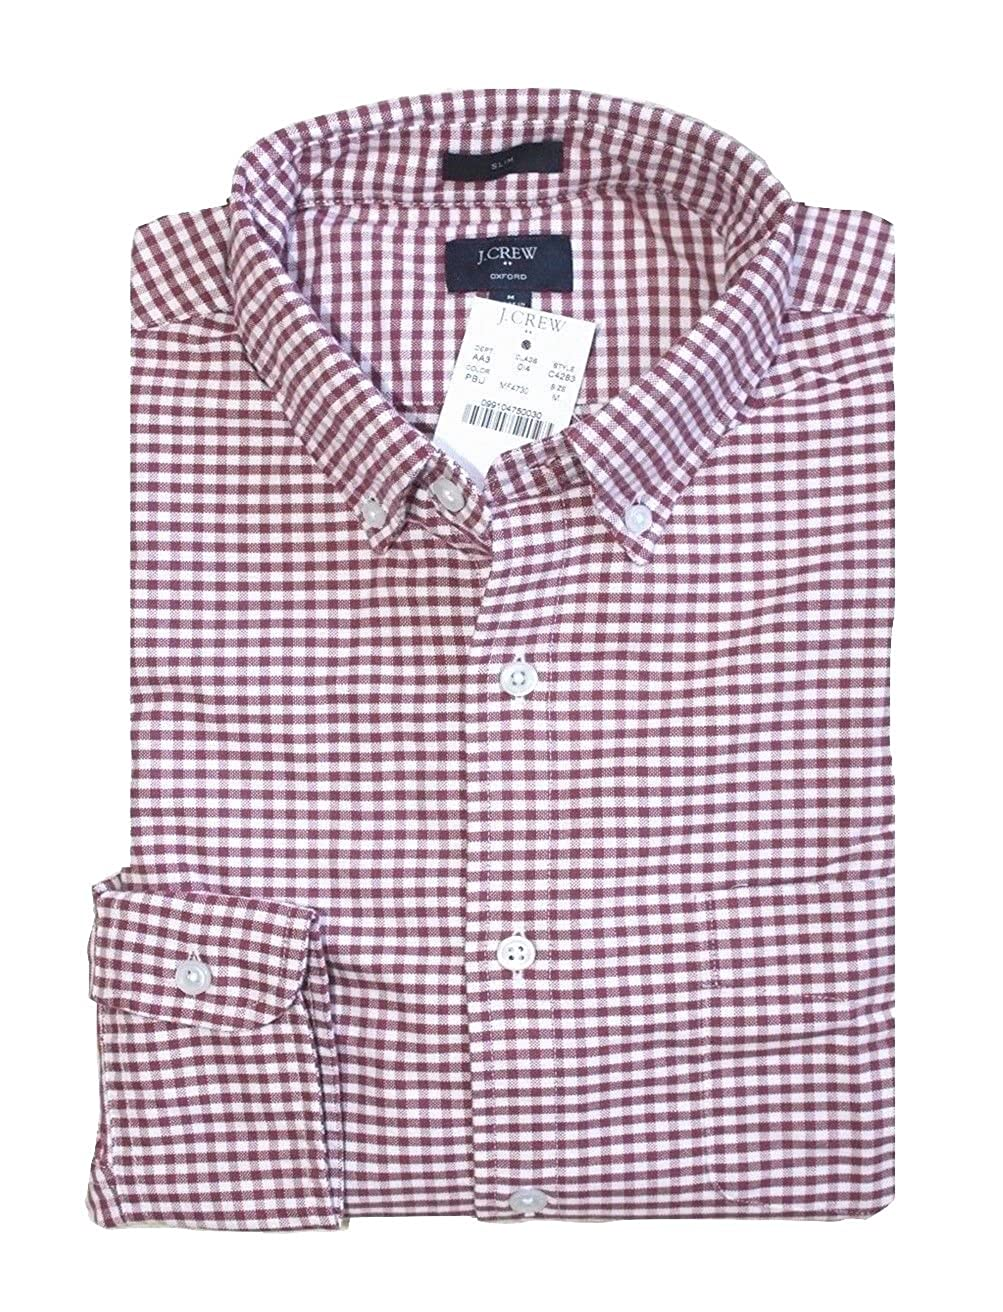 J Crew Factory Gingham Plaid Oxford Shirt Mens Slim Fit